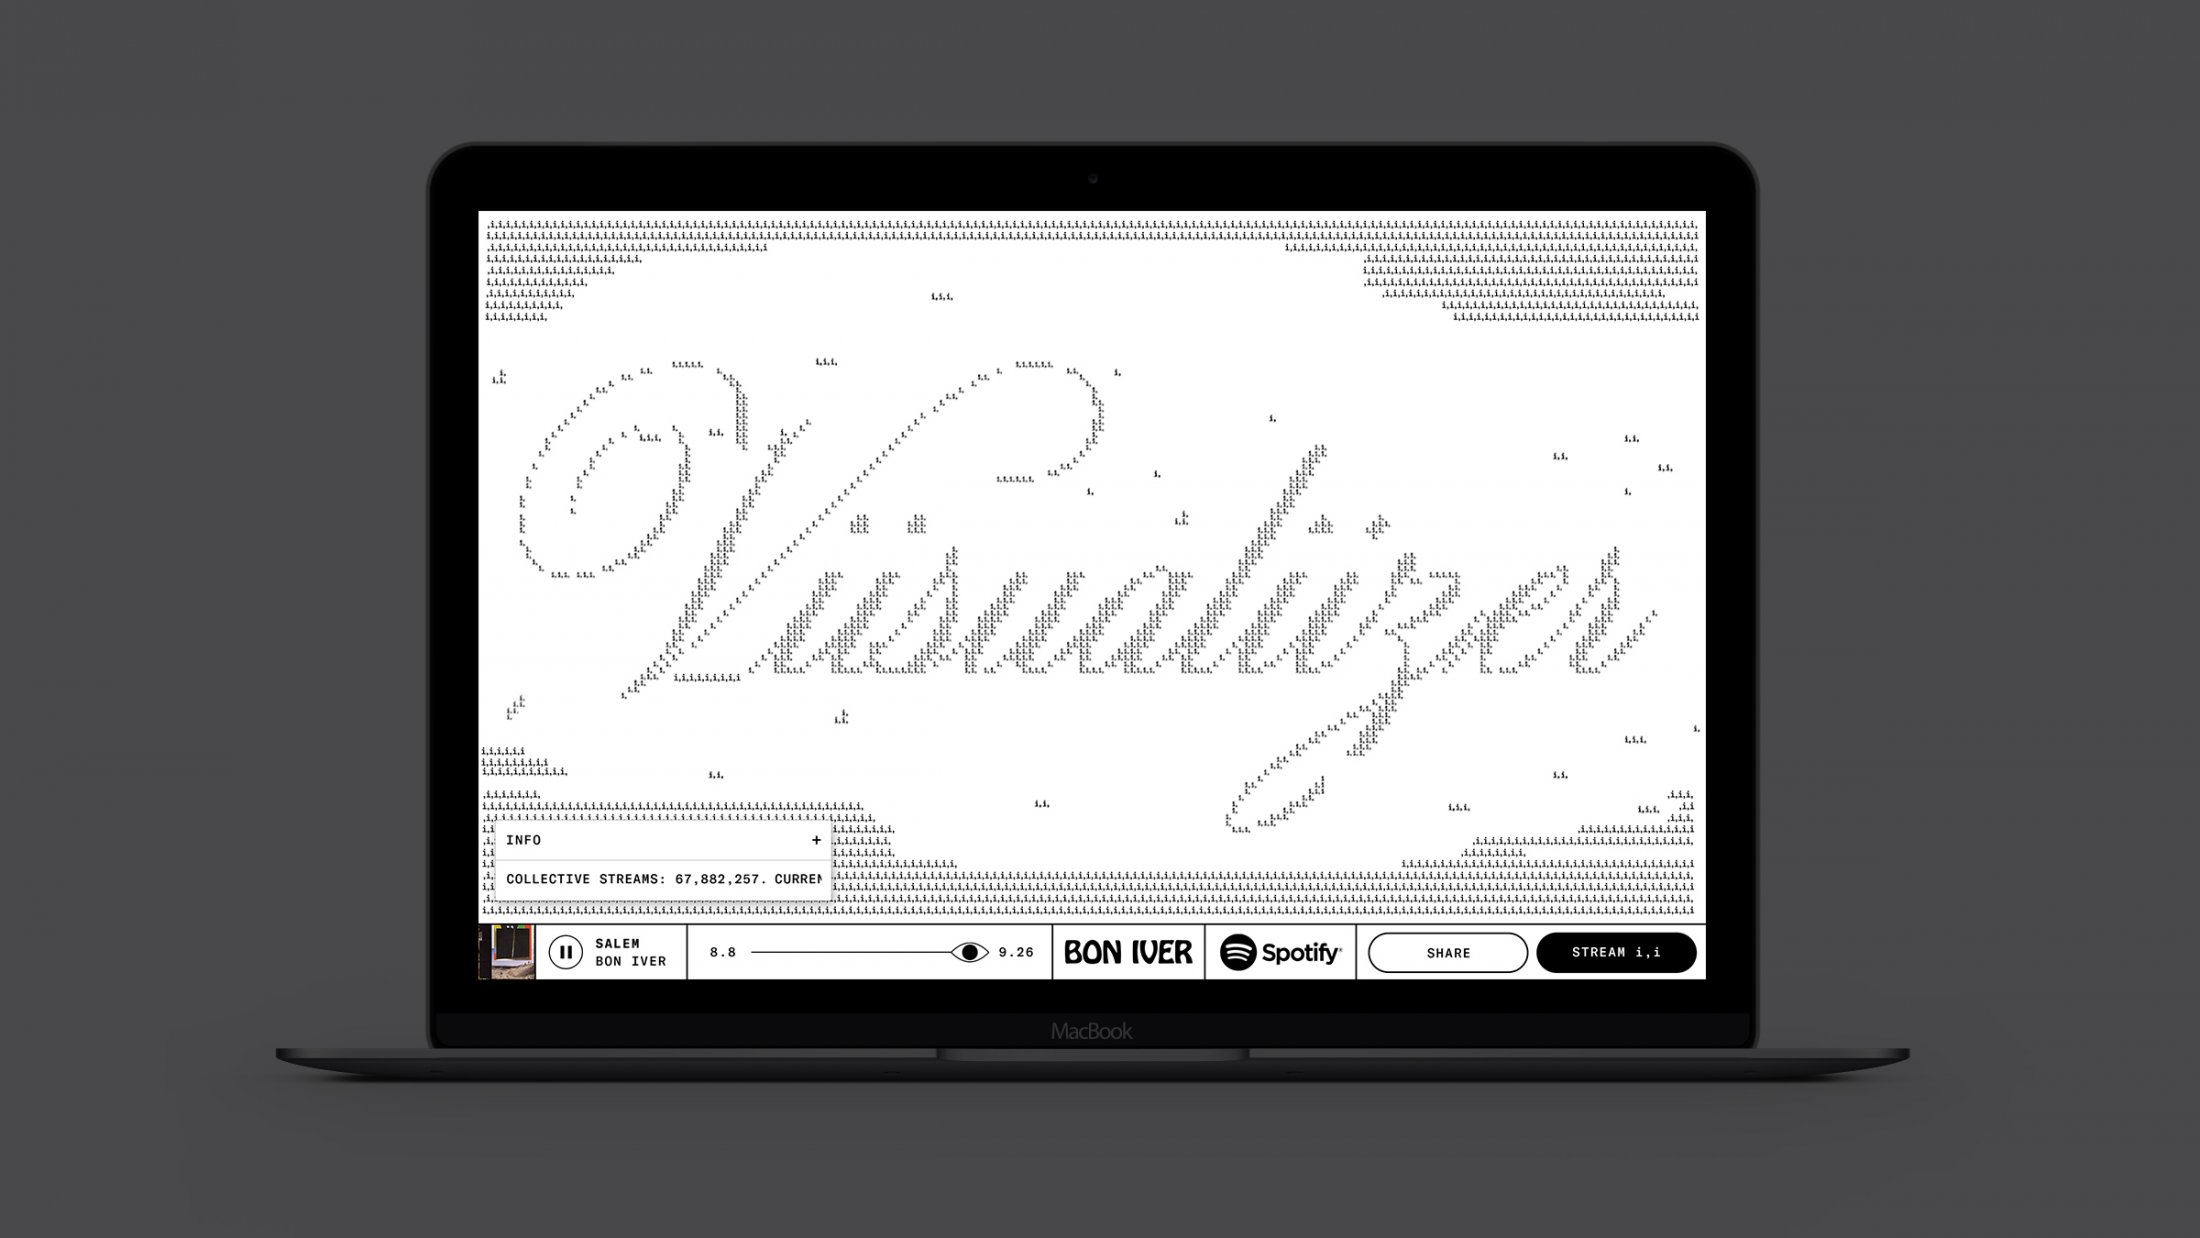 Thumbnail for Bon Iver Viisualiizer